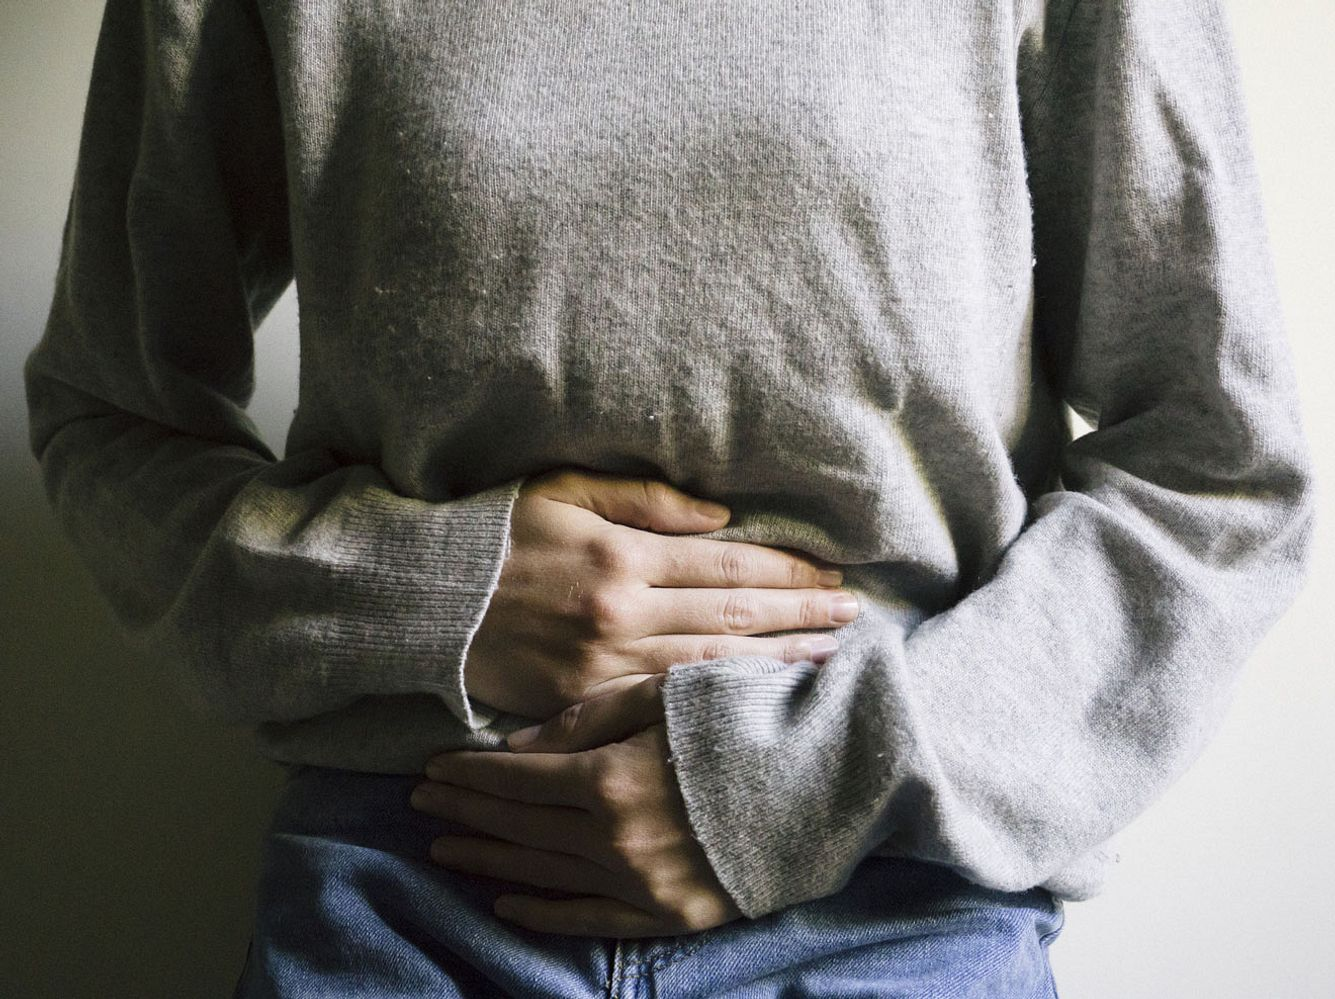 Reizdarm-Syndrom: Symptome und Hilfsmittel